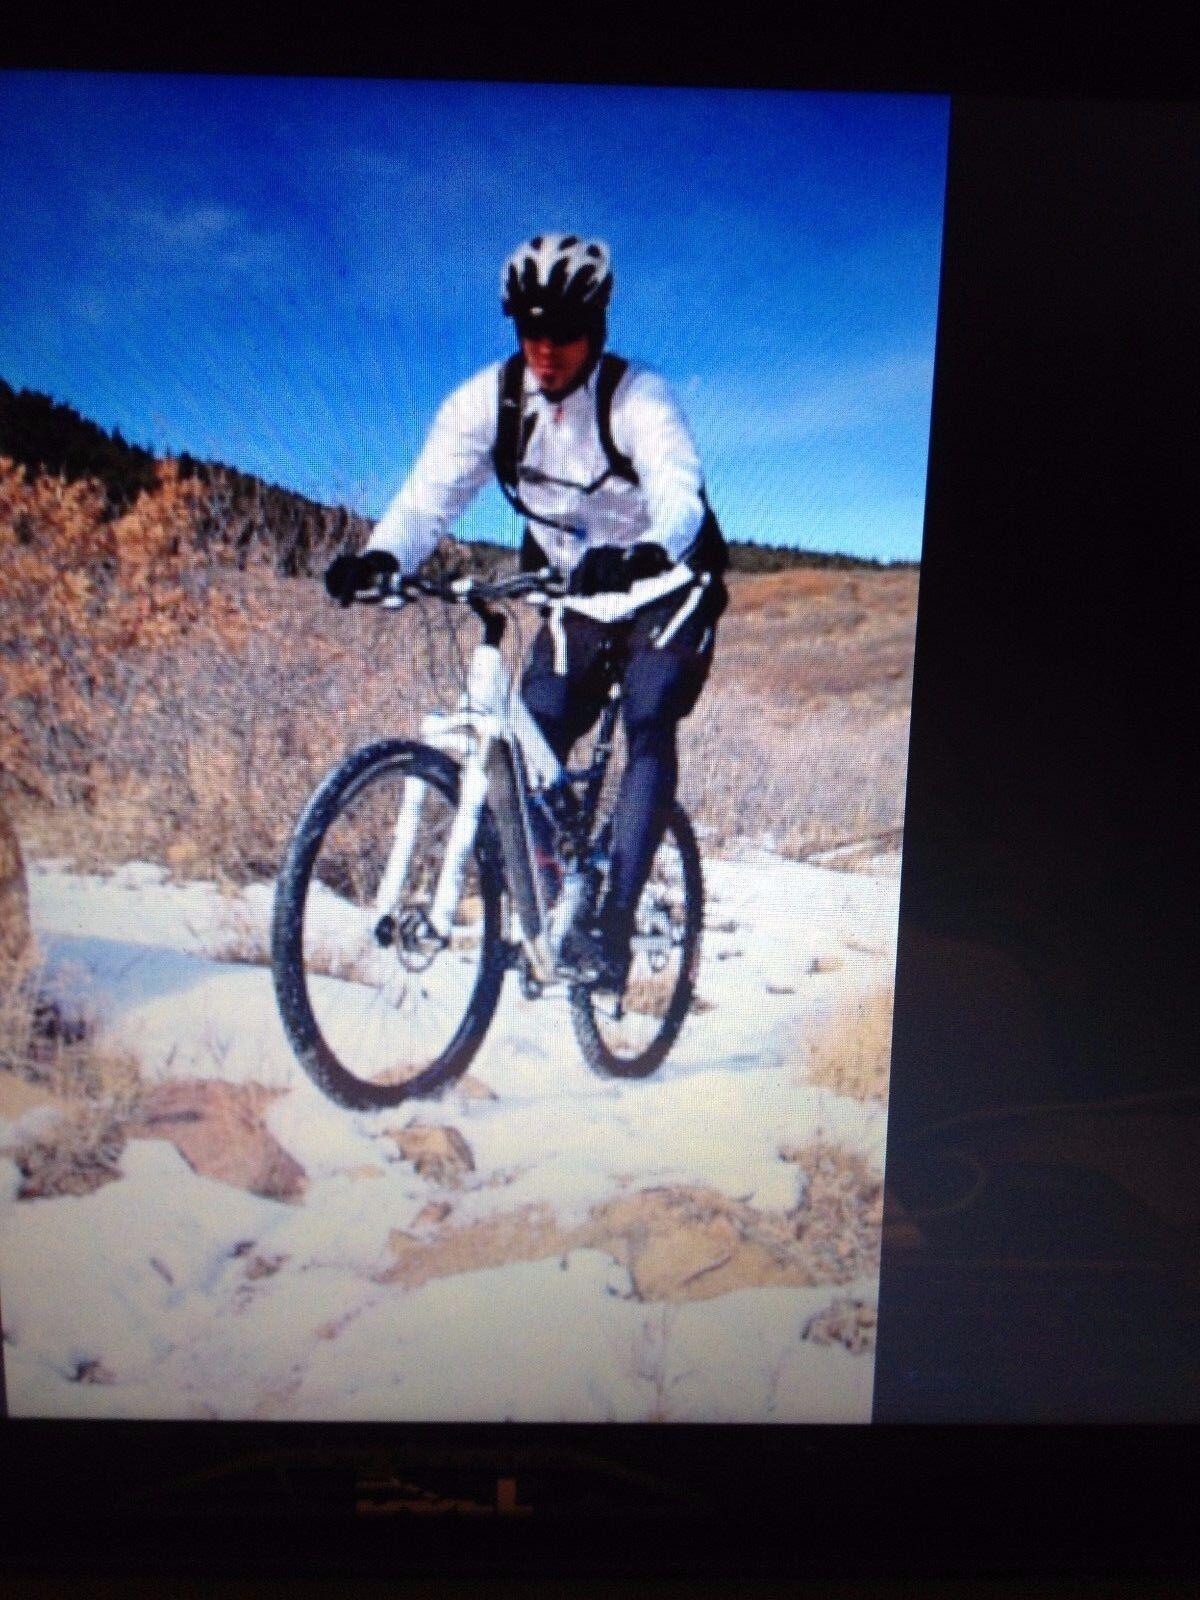 Bicicleta Fat Bike Neumático Tacos Tracción en Dirt Barros & Ice  1000 Agarre